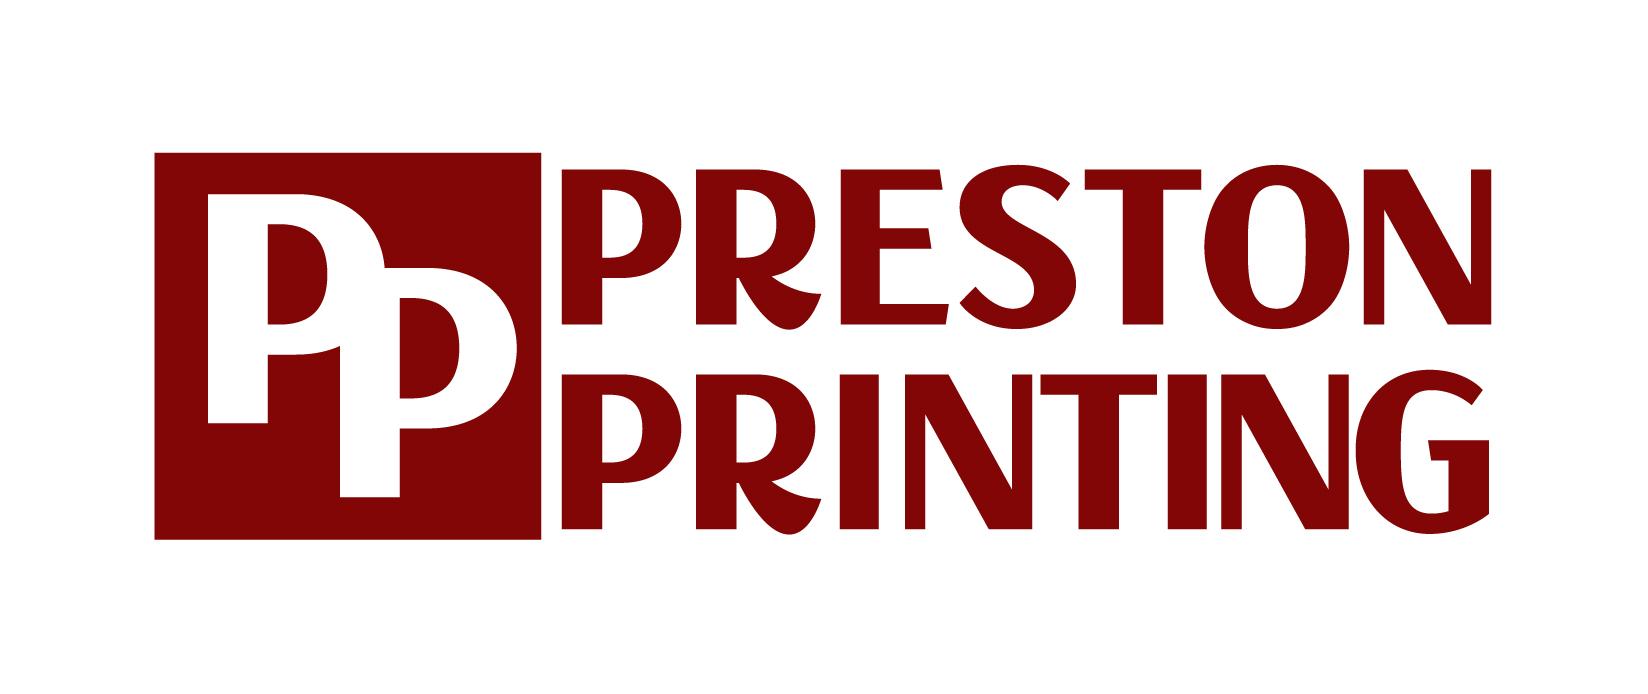 Preston Printing